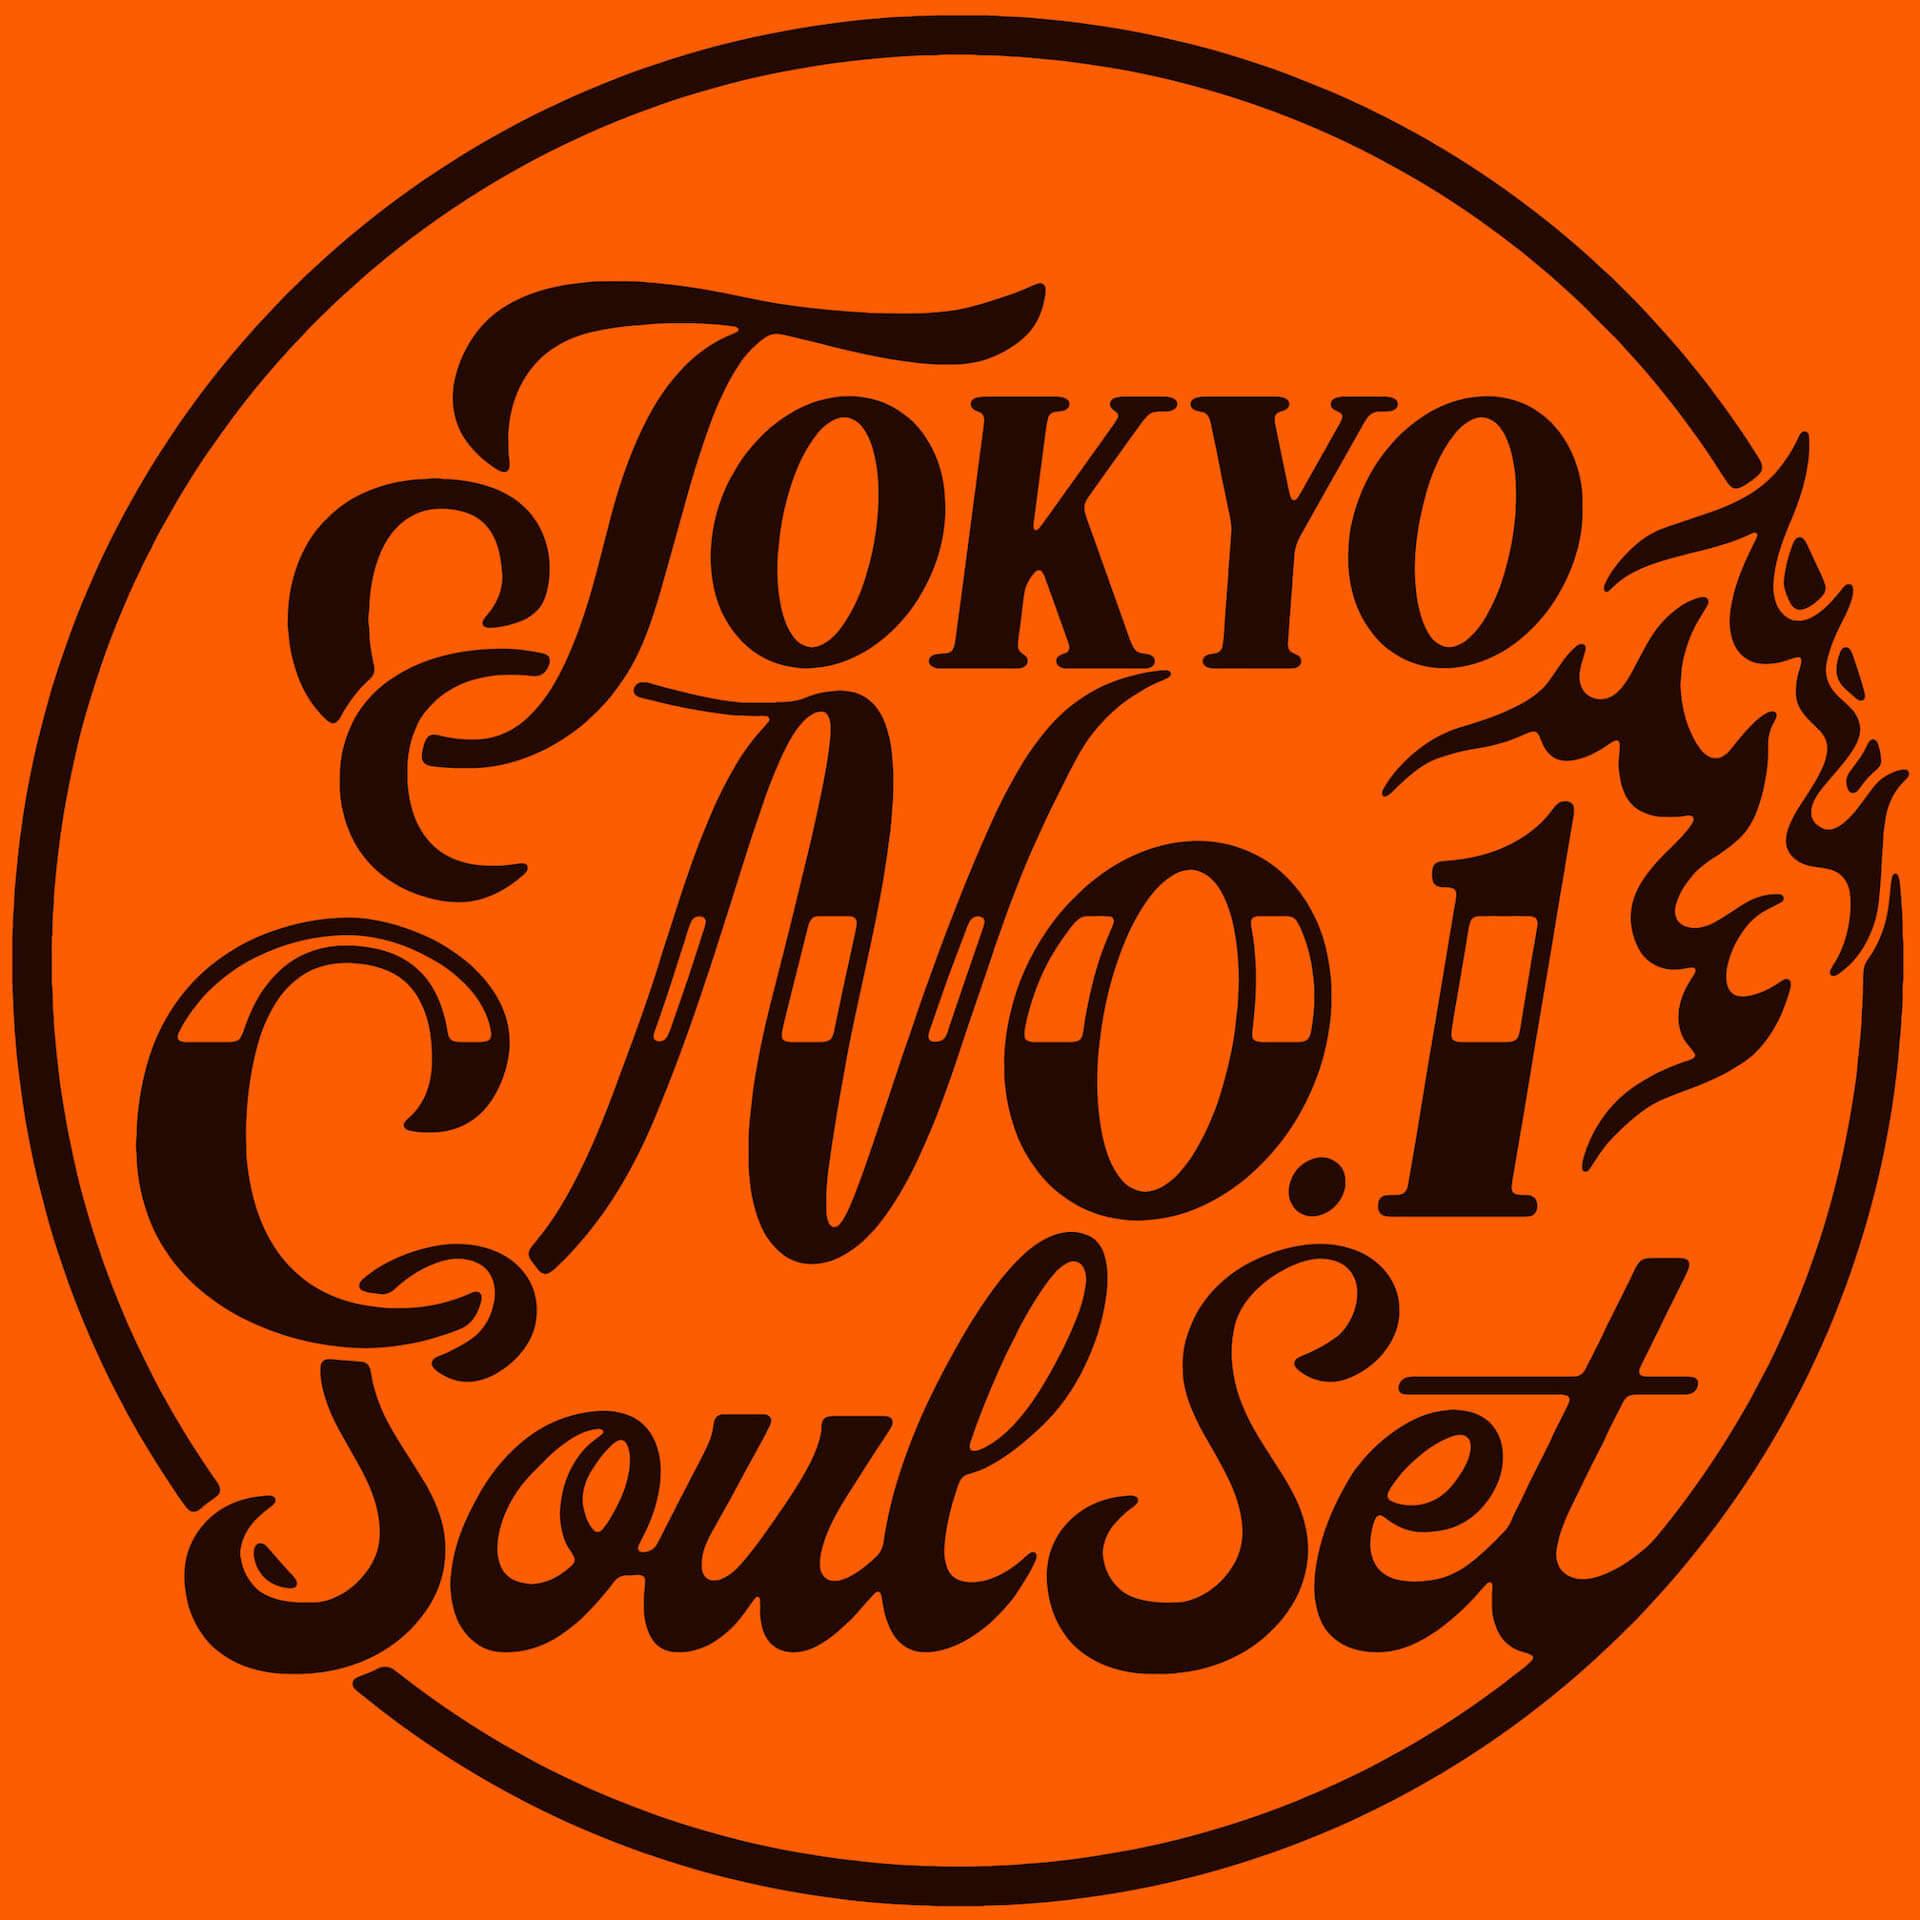 "TOKYO No.1 SOUL SET30周年記念企画第2弾!""ELEPHANT BUMP""のリメイクバージョンが本日リリース music20201028_tokyono1soulset_1"